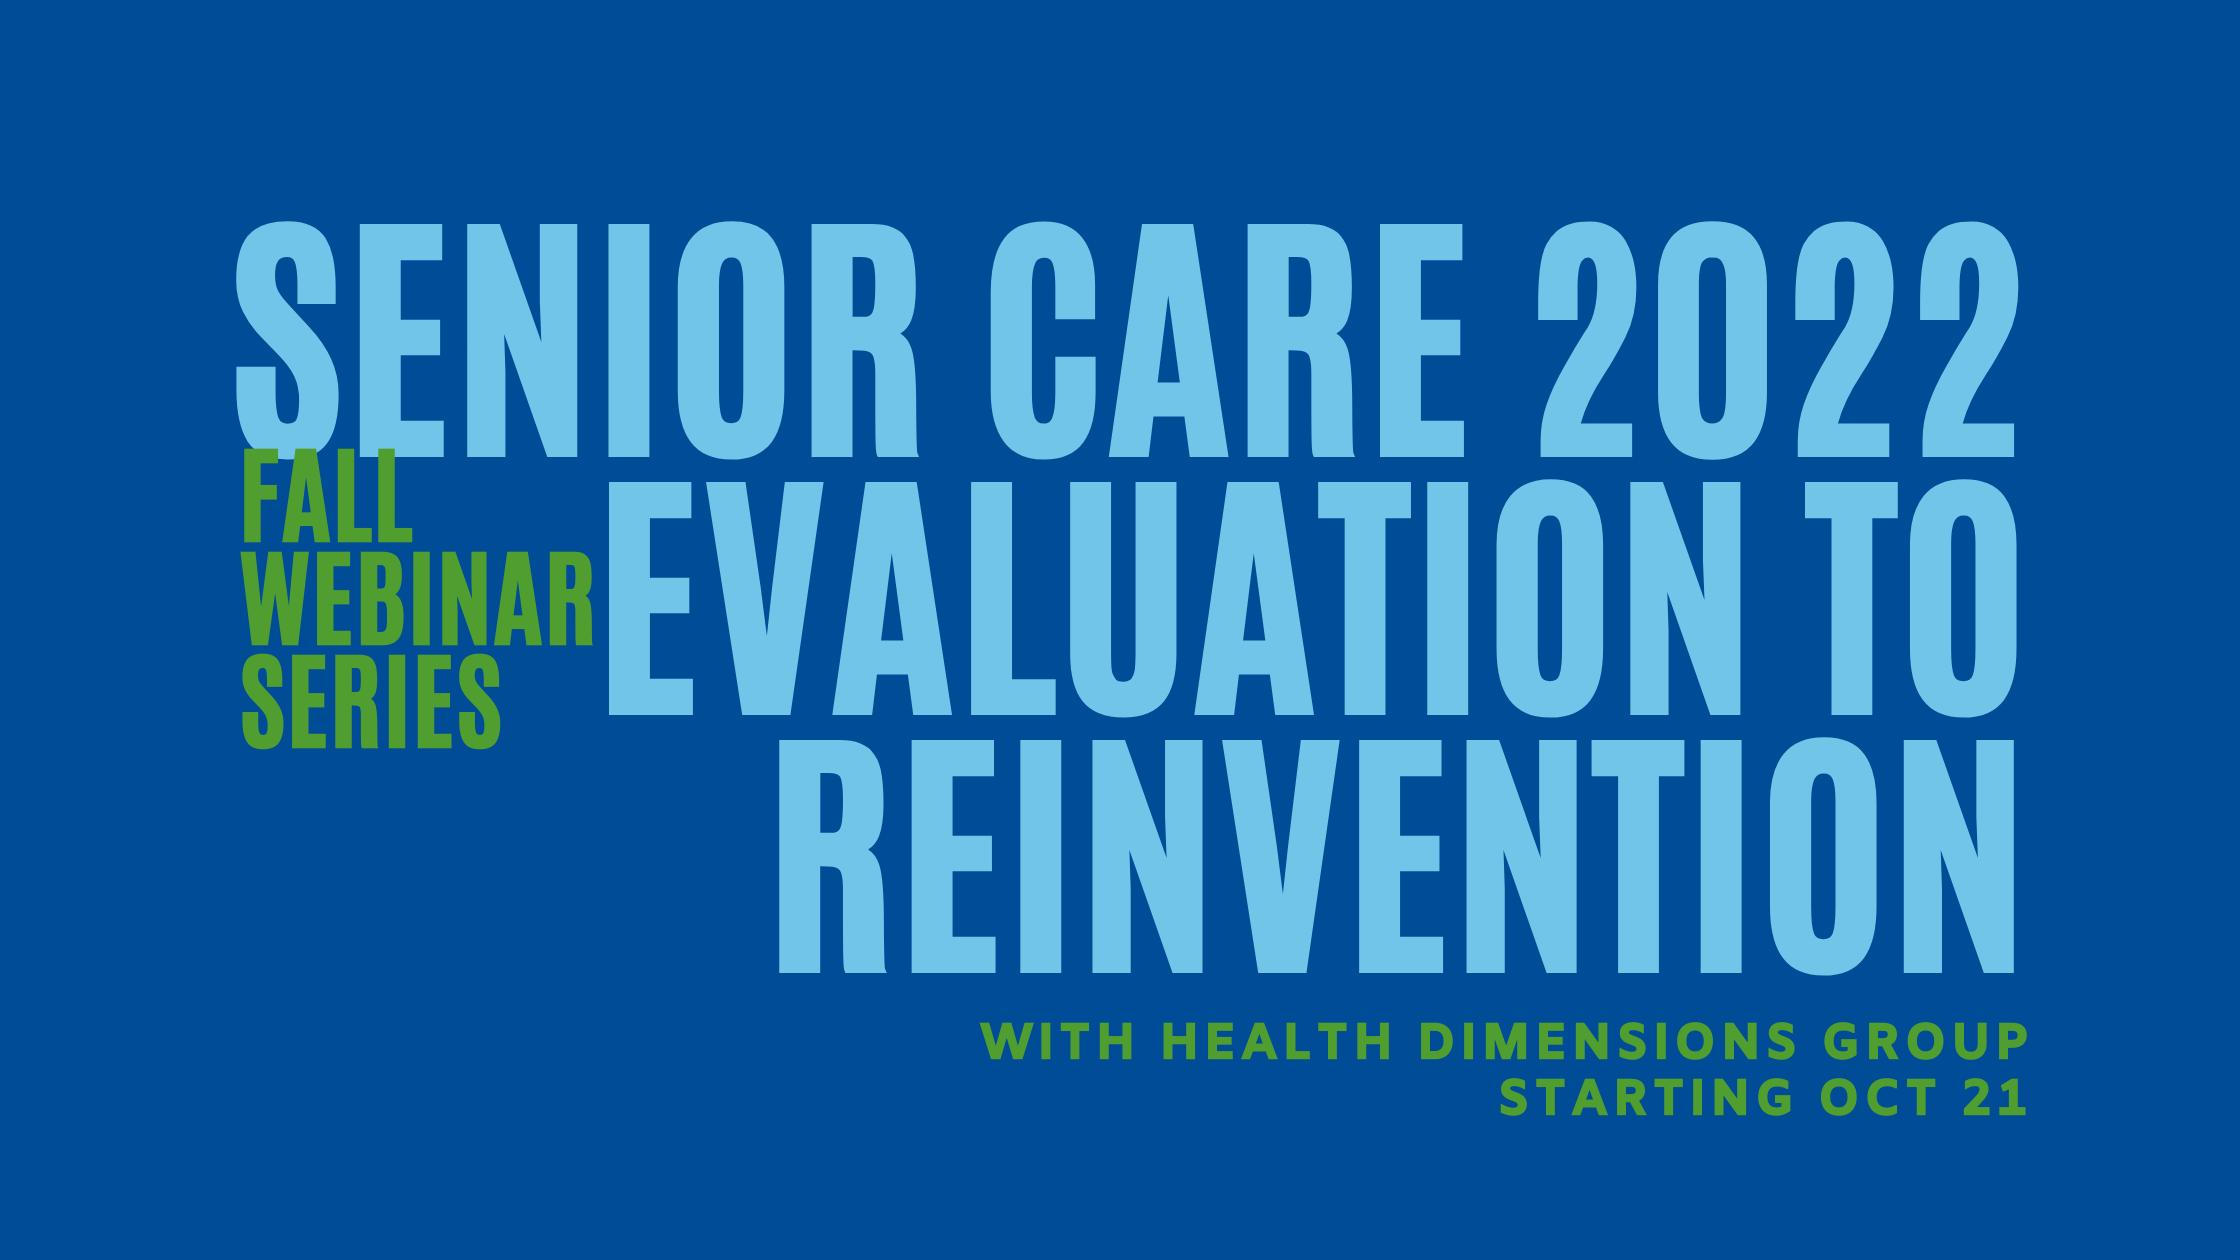 Fall Webinar Series: Senior Care 2022 - Evaluation to Reinvention